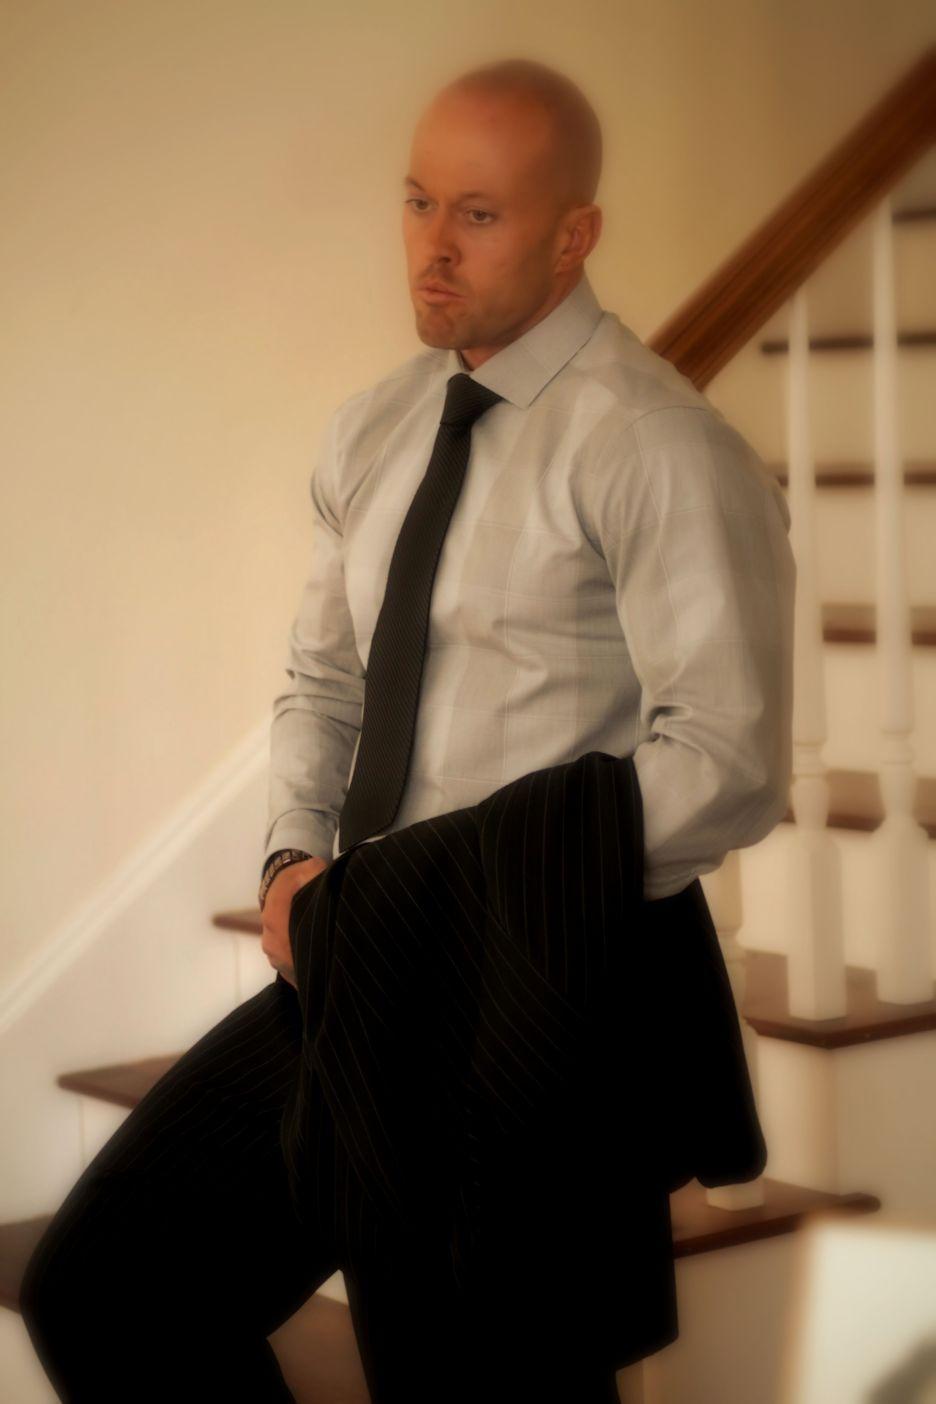 Tattooed Fashion Model John Quinlan in Apparel by Calvin Klein 2014